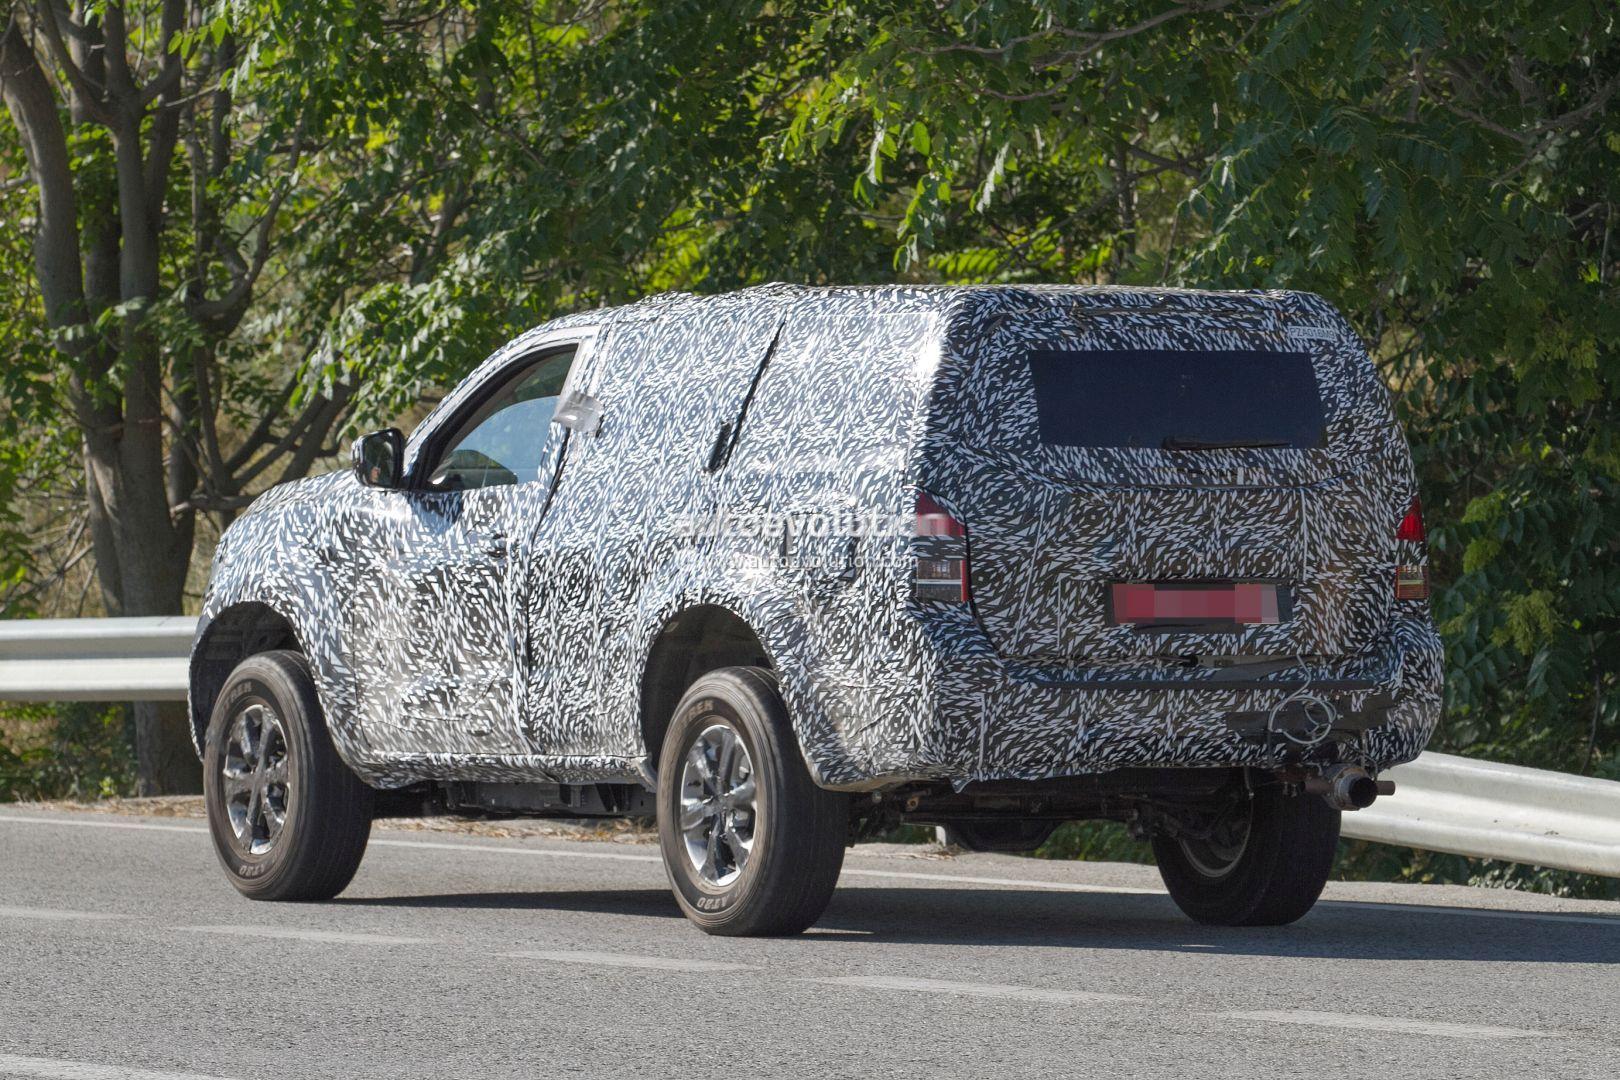 Next Gen Nissan Pathfinder Spied Shows Radical Front End Design Change